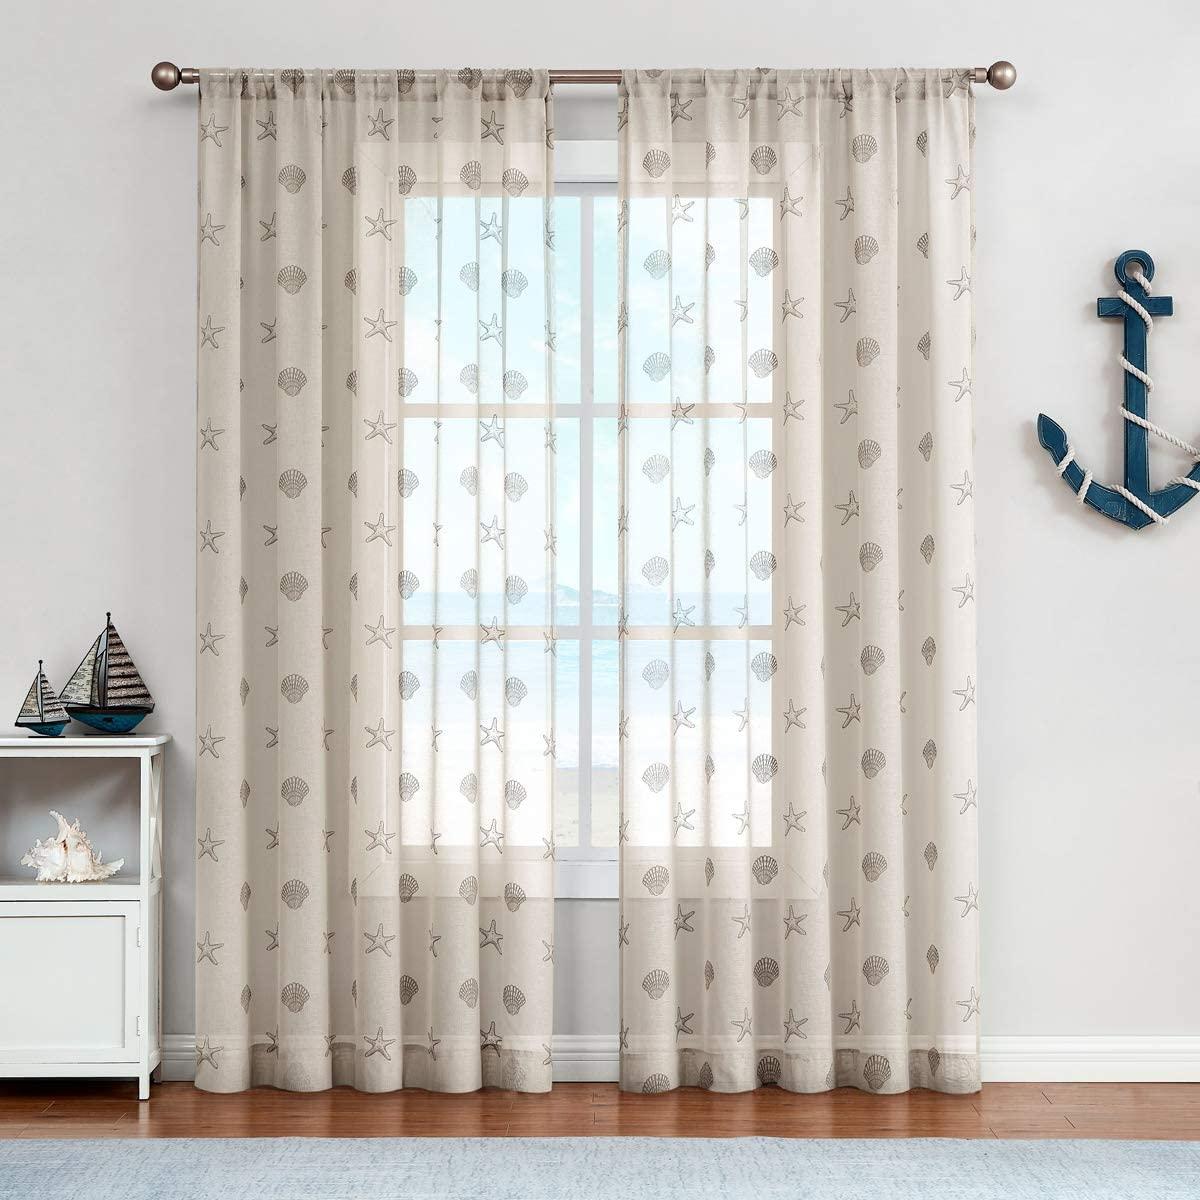 jinchan Beige 63 Inch Seashells Pattern Tan Sheer Curtains Living Room Darpes Window Sheers for Bedroom Beach Curtain Panels 63 Inch Summer 2 Panels